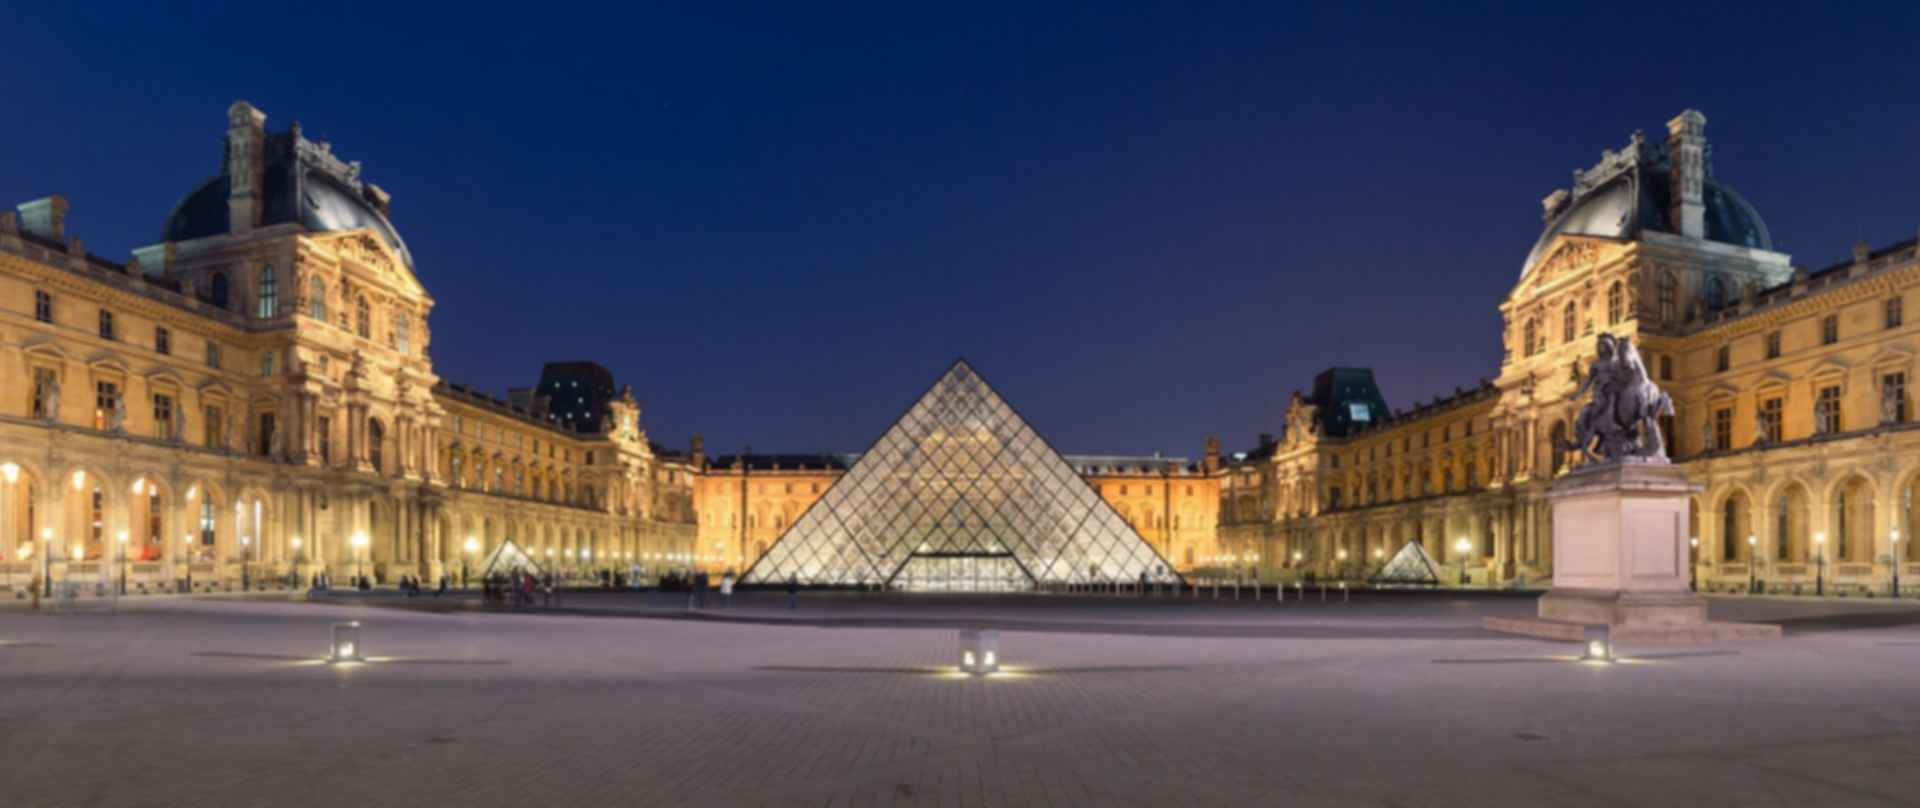 The Louvre Paris - Pyramid Exterior